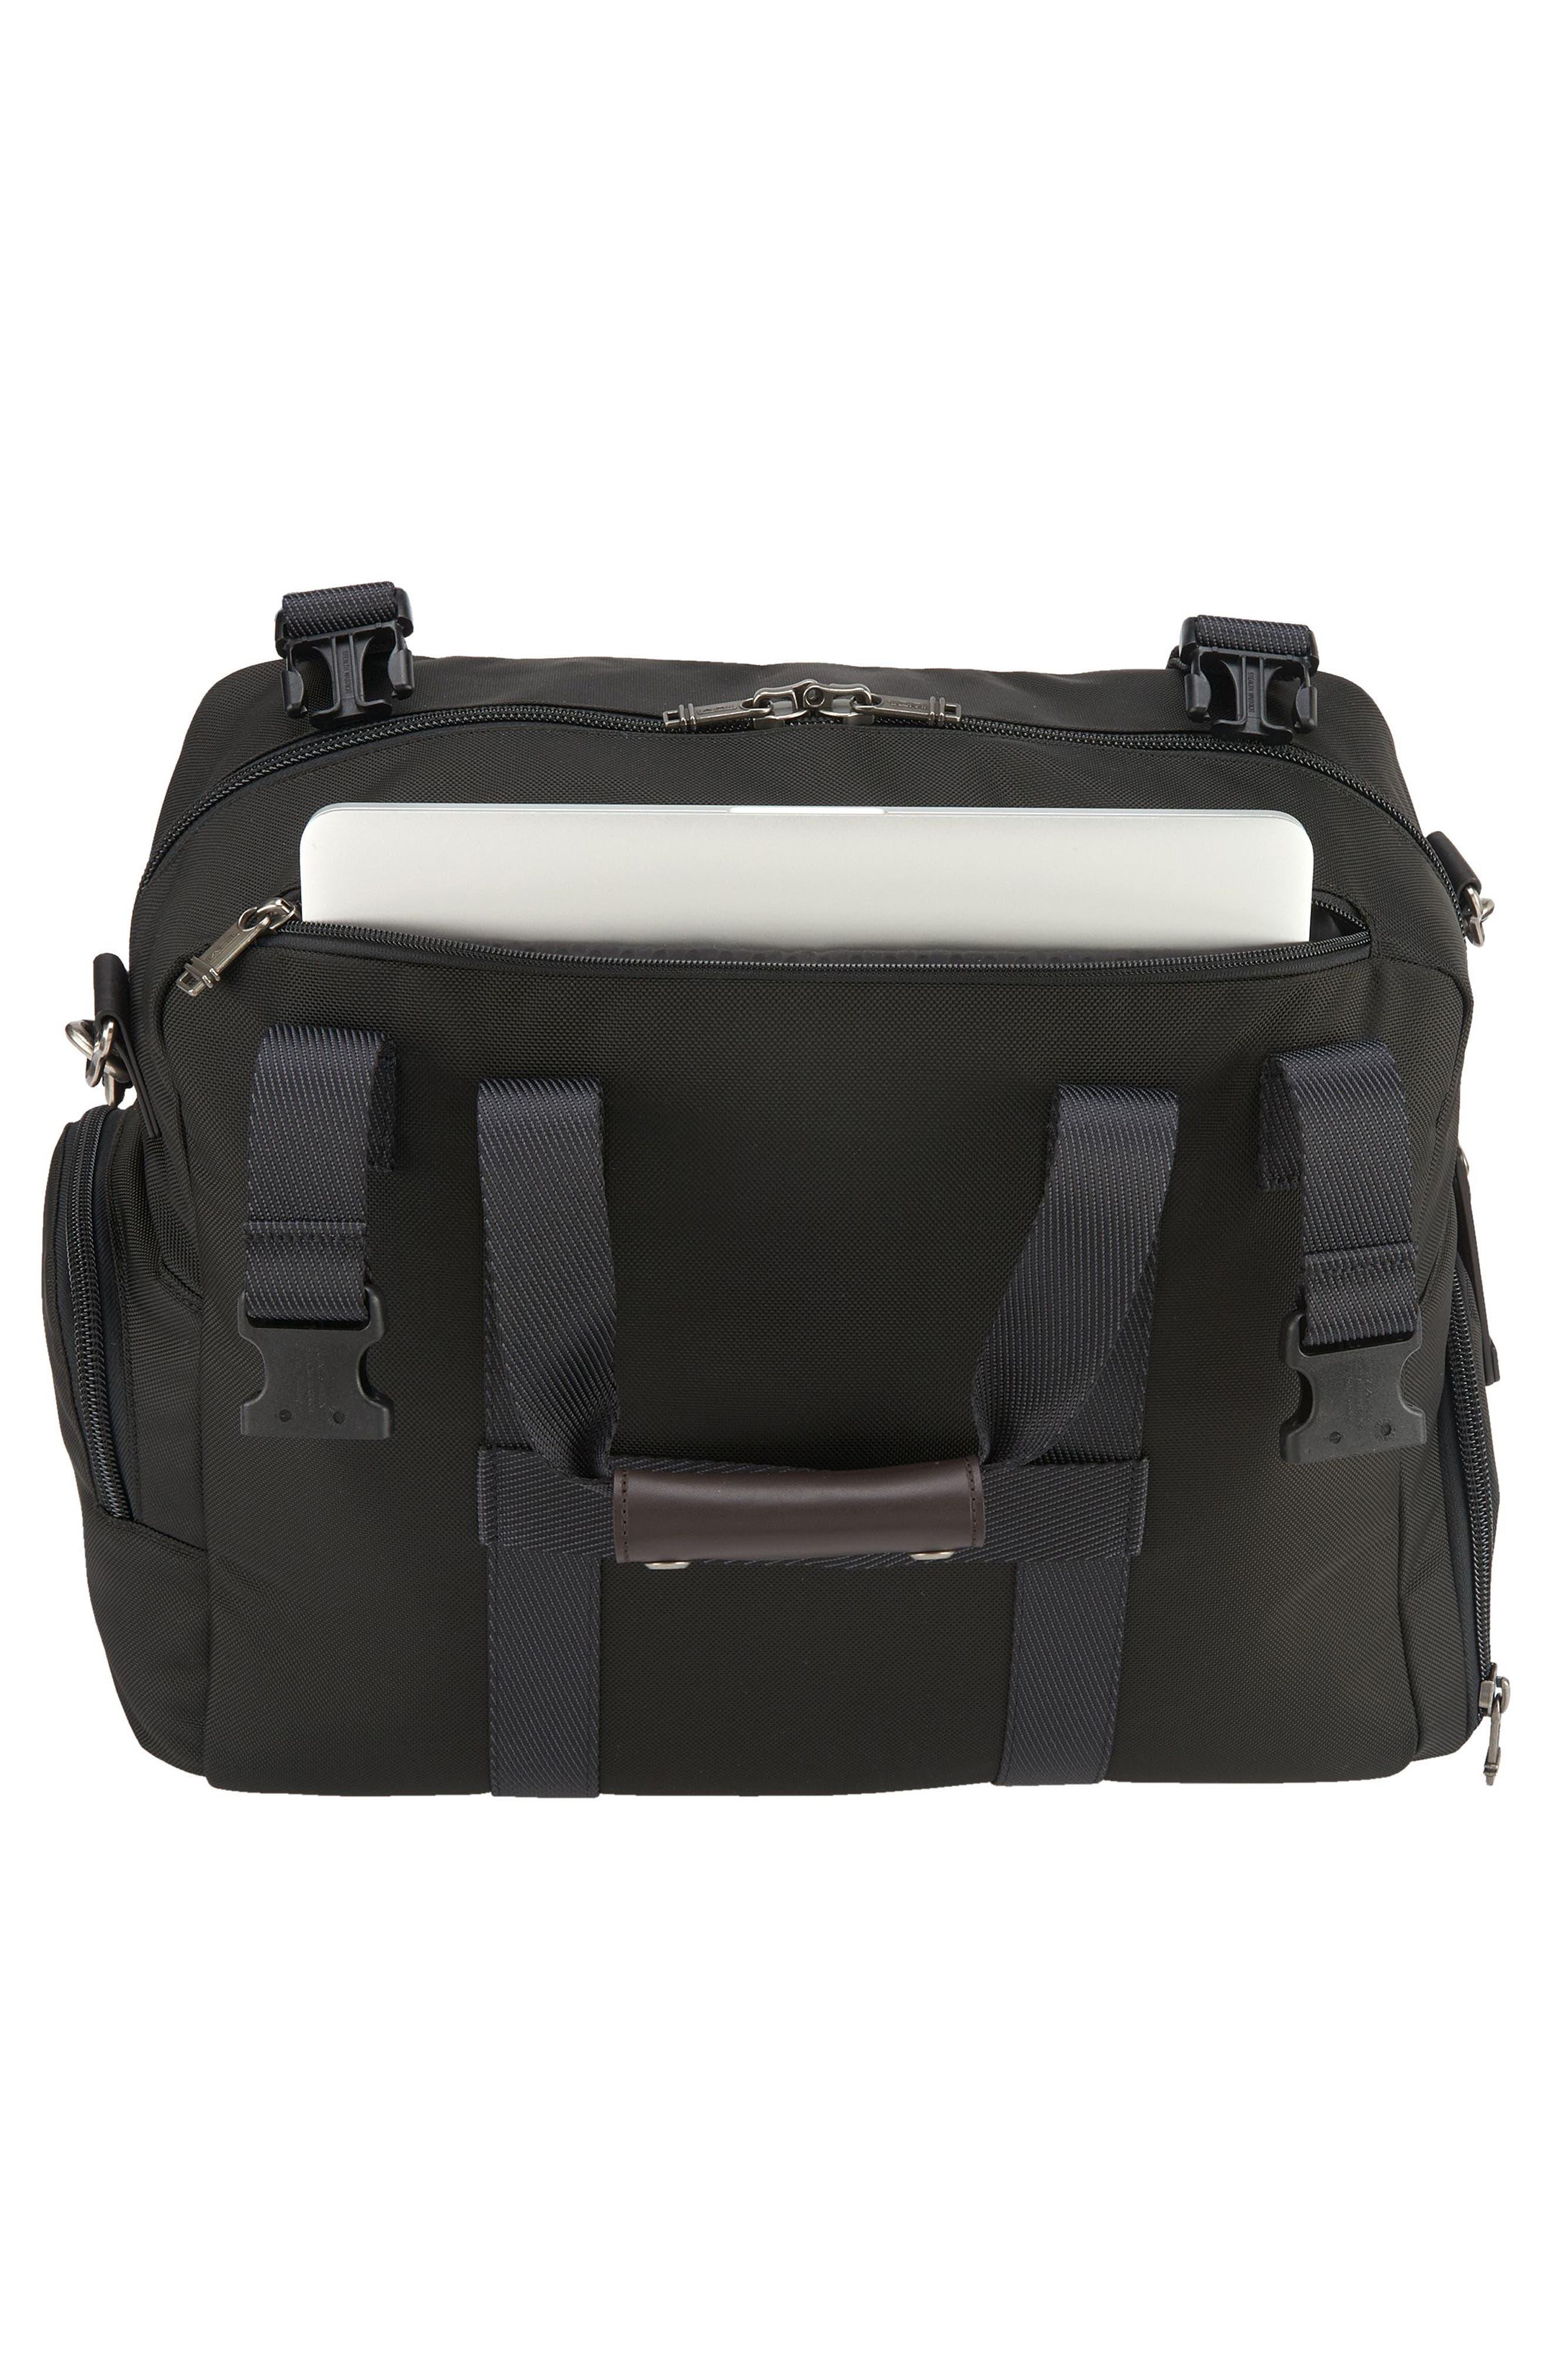 Alpha Bravo Buckner Duffel Bag,                             Alternate thumbnail 2, color,                             001